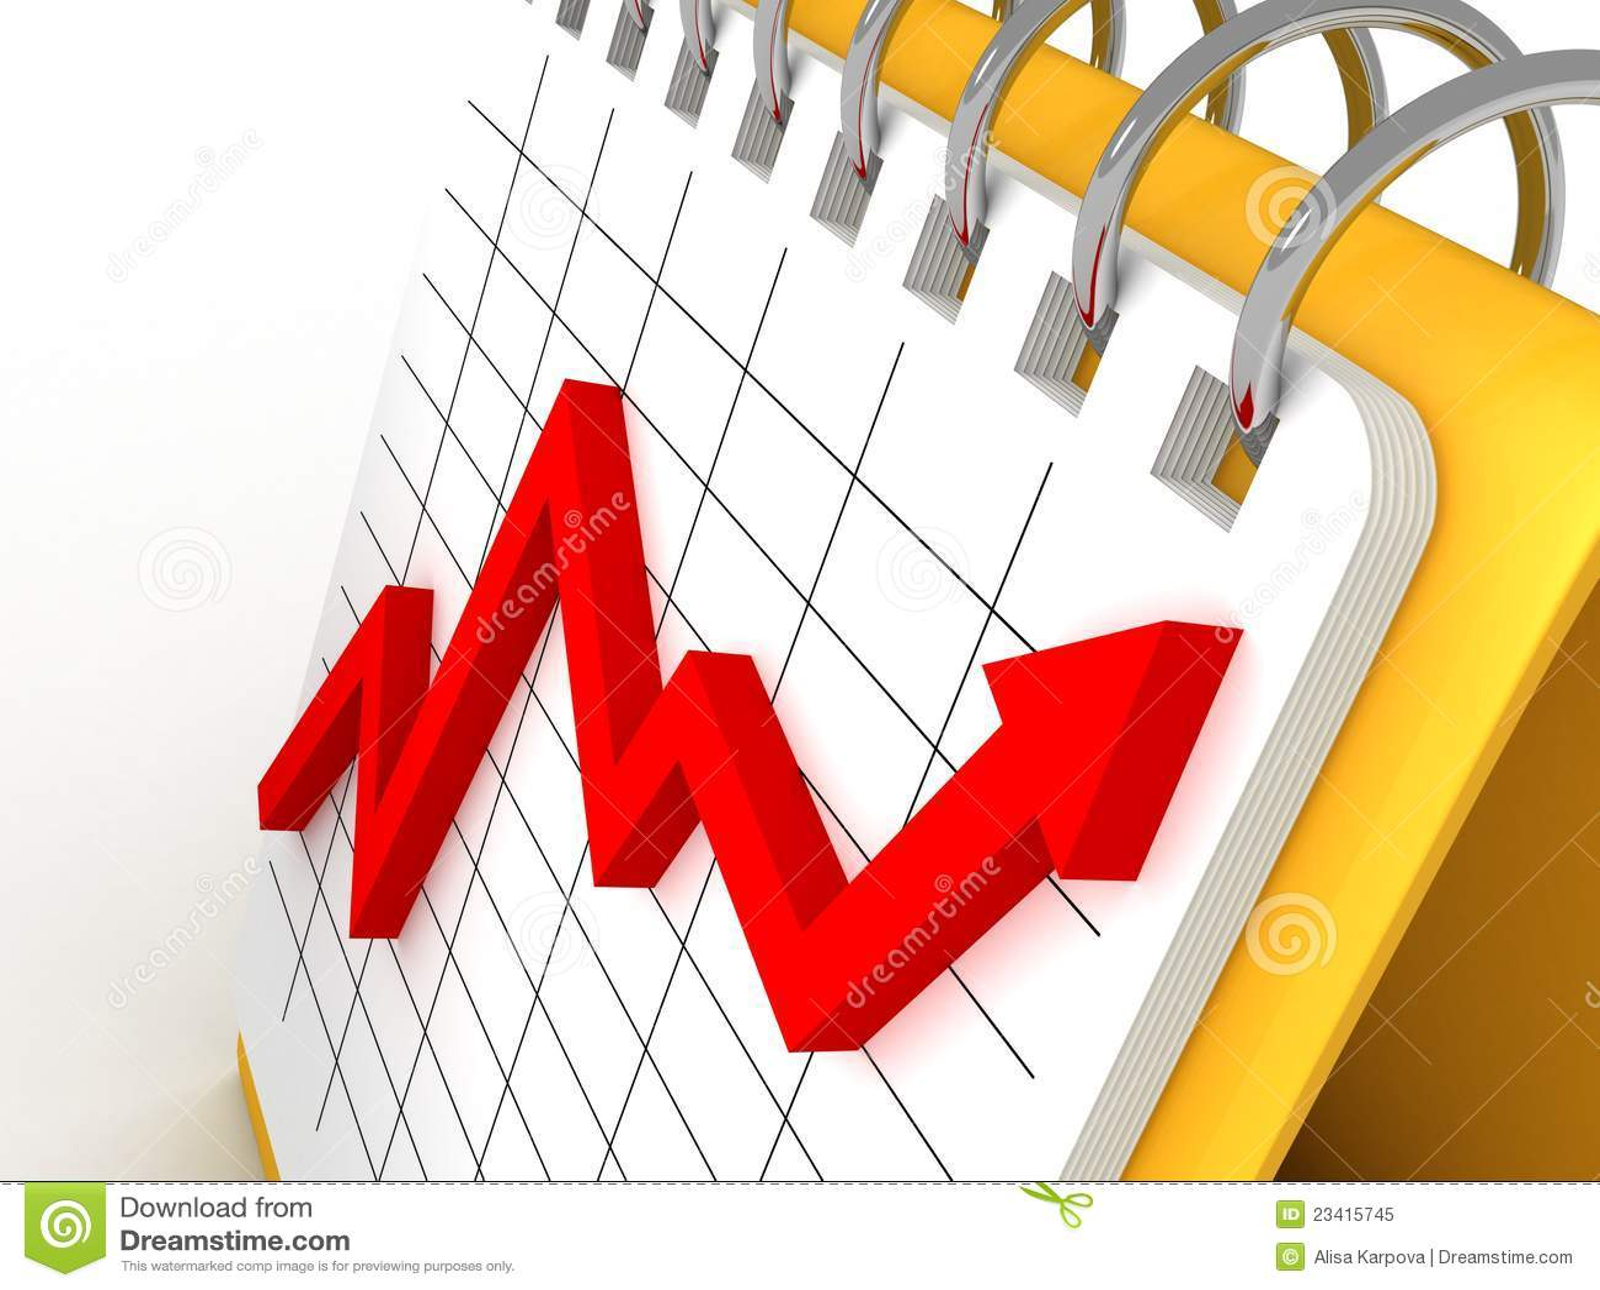 red growing profit arrow graph on desk calendar royalty